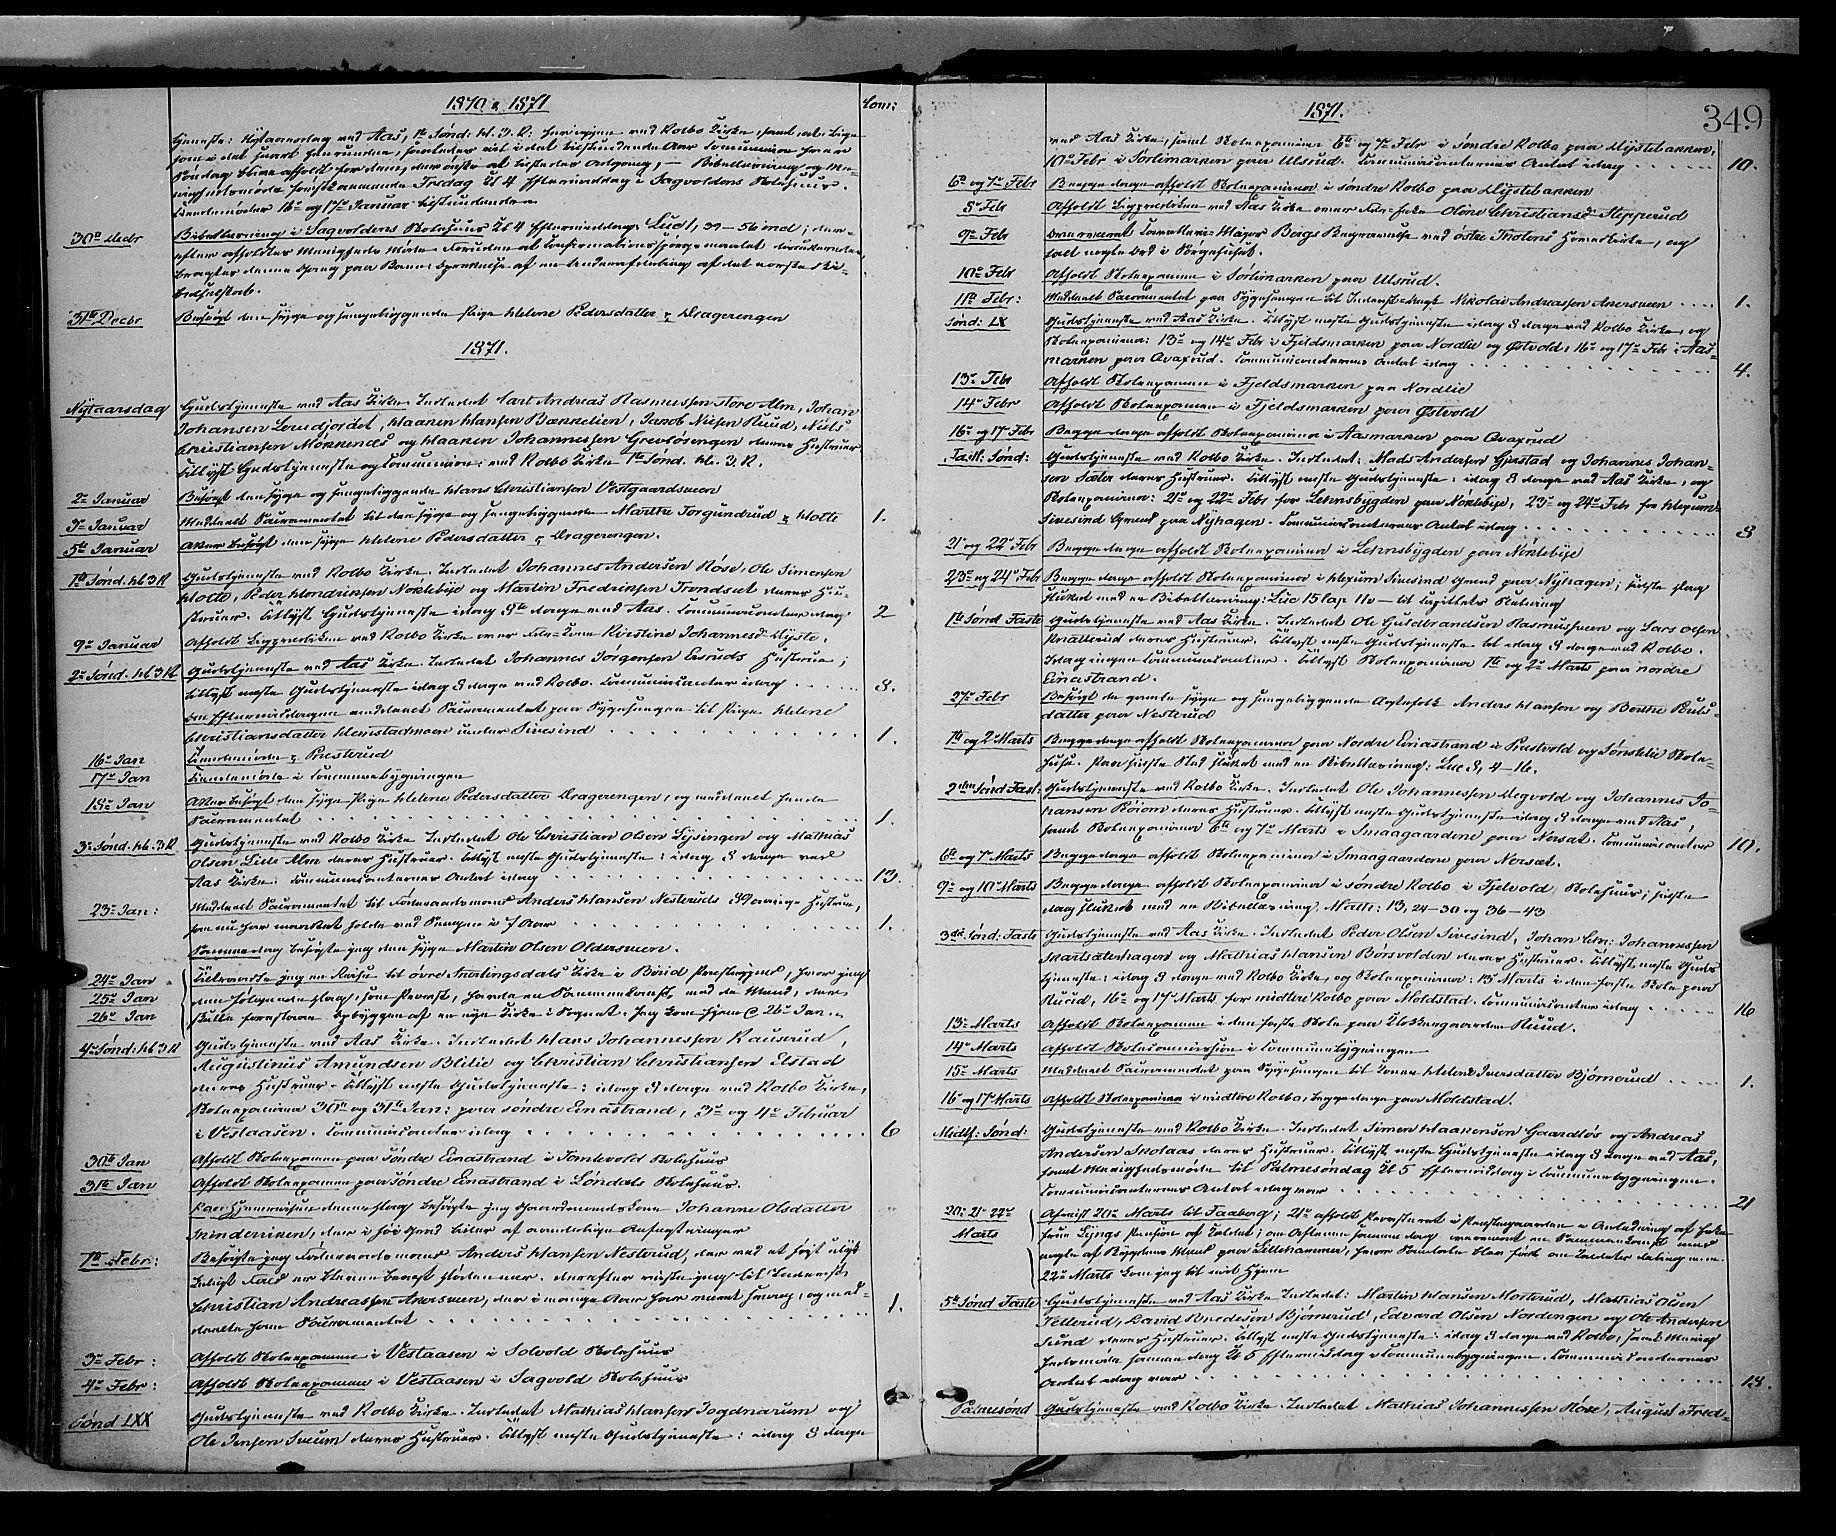 SAH, Vestre Toten prestekontor, H/Ha/Haa/L0008: Ministerialbok nr. 8, 1870-1877, s. 349